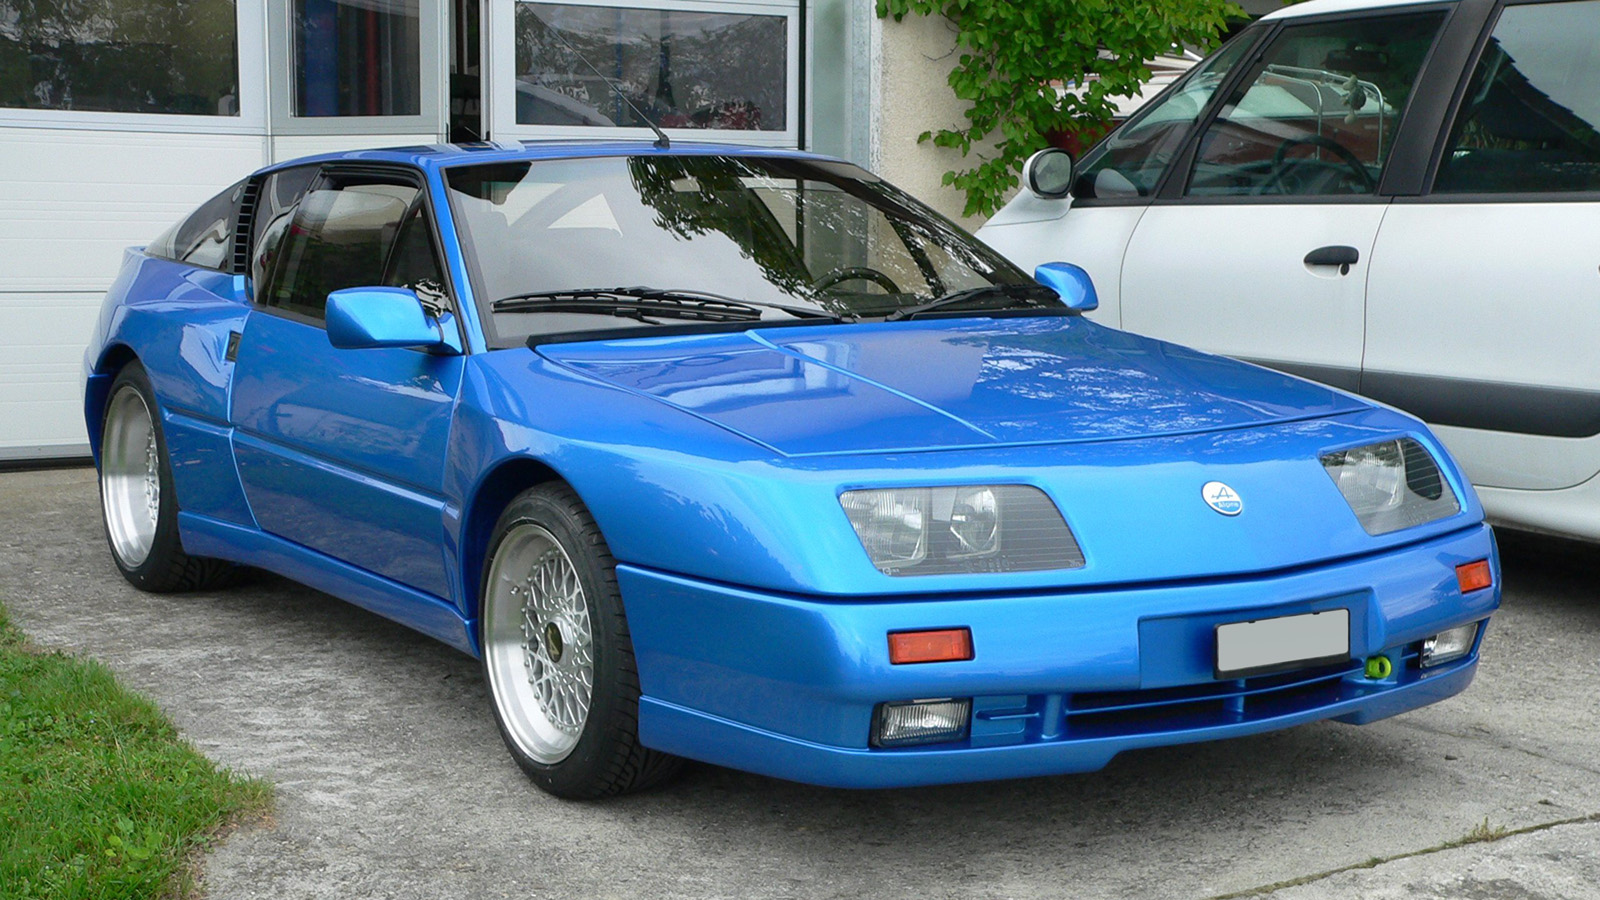 Alfaromeo Used Cars amp Bakkies for Sale in Sandton